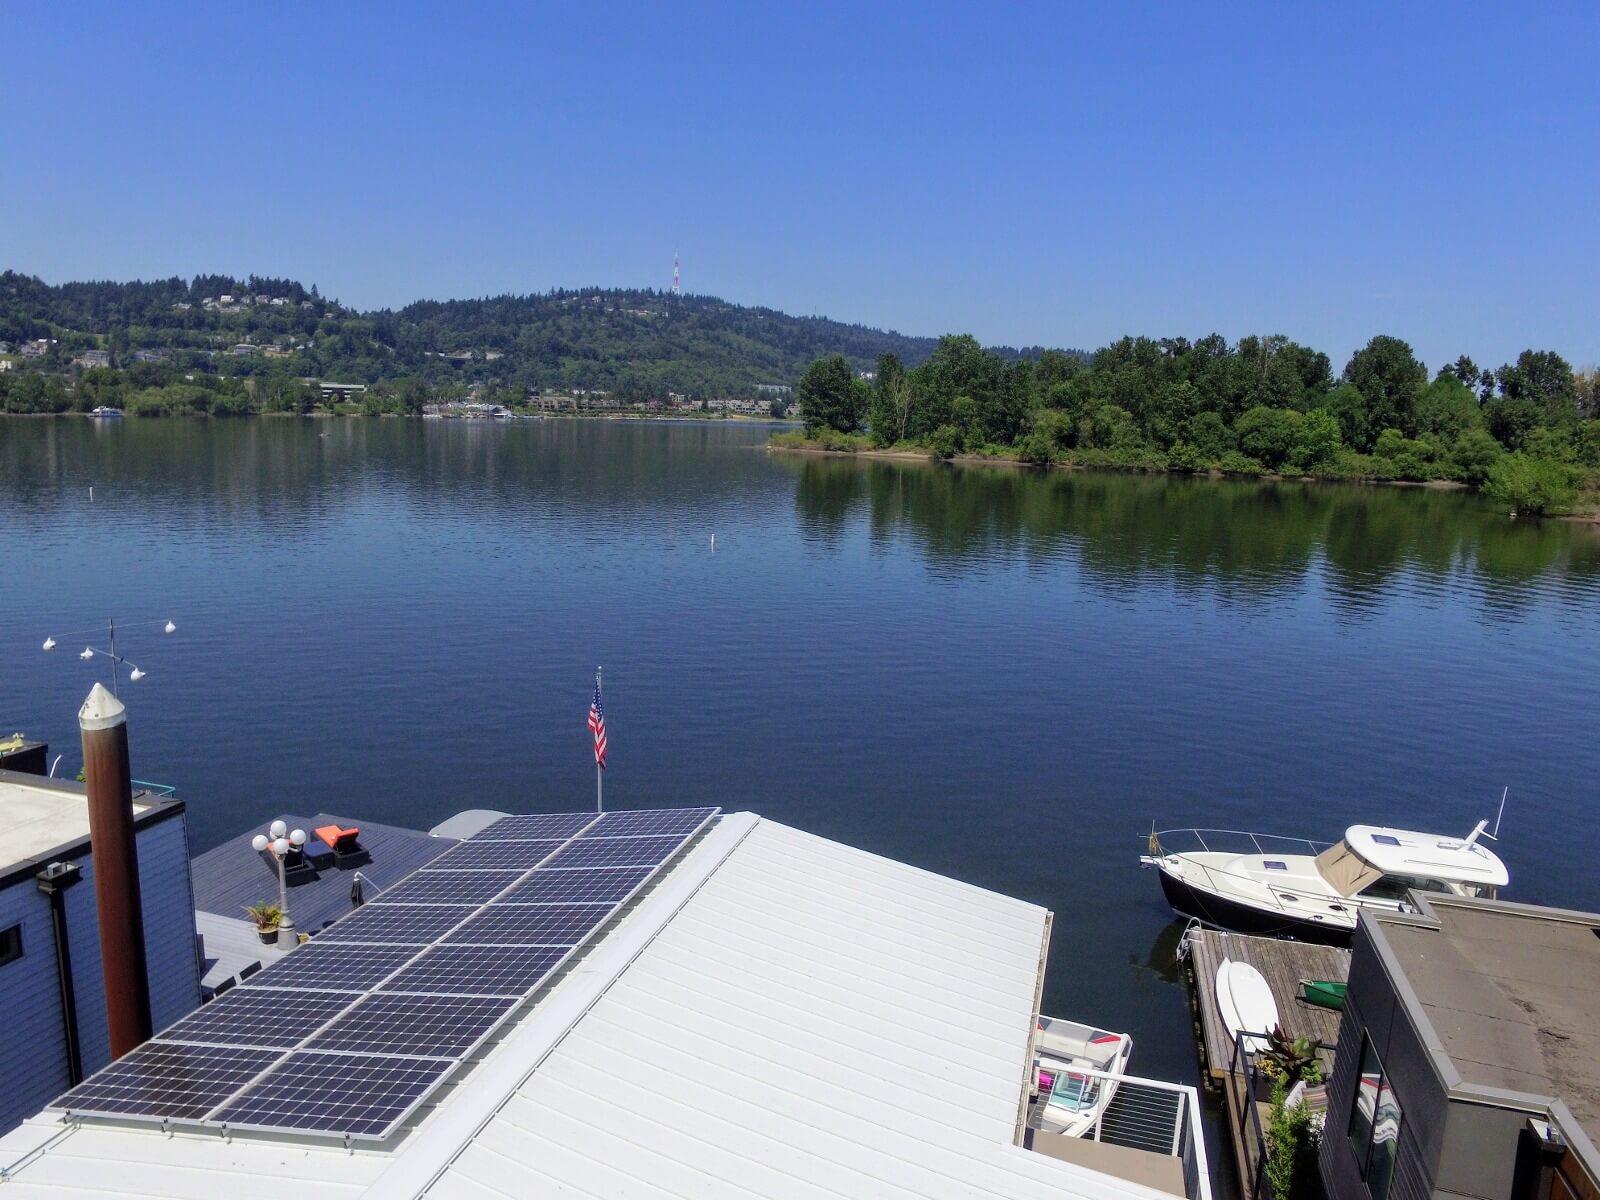 solar panels near water.jpeg